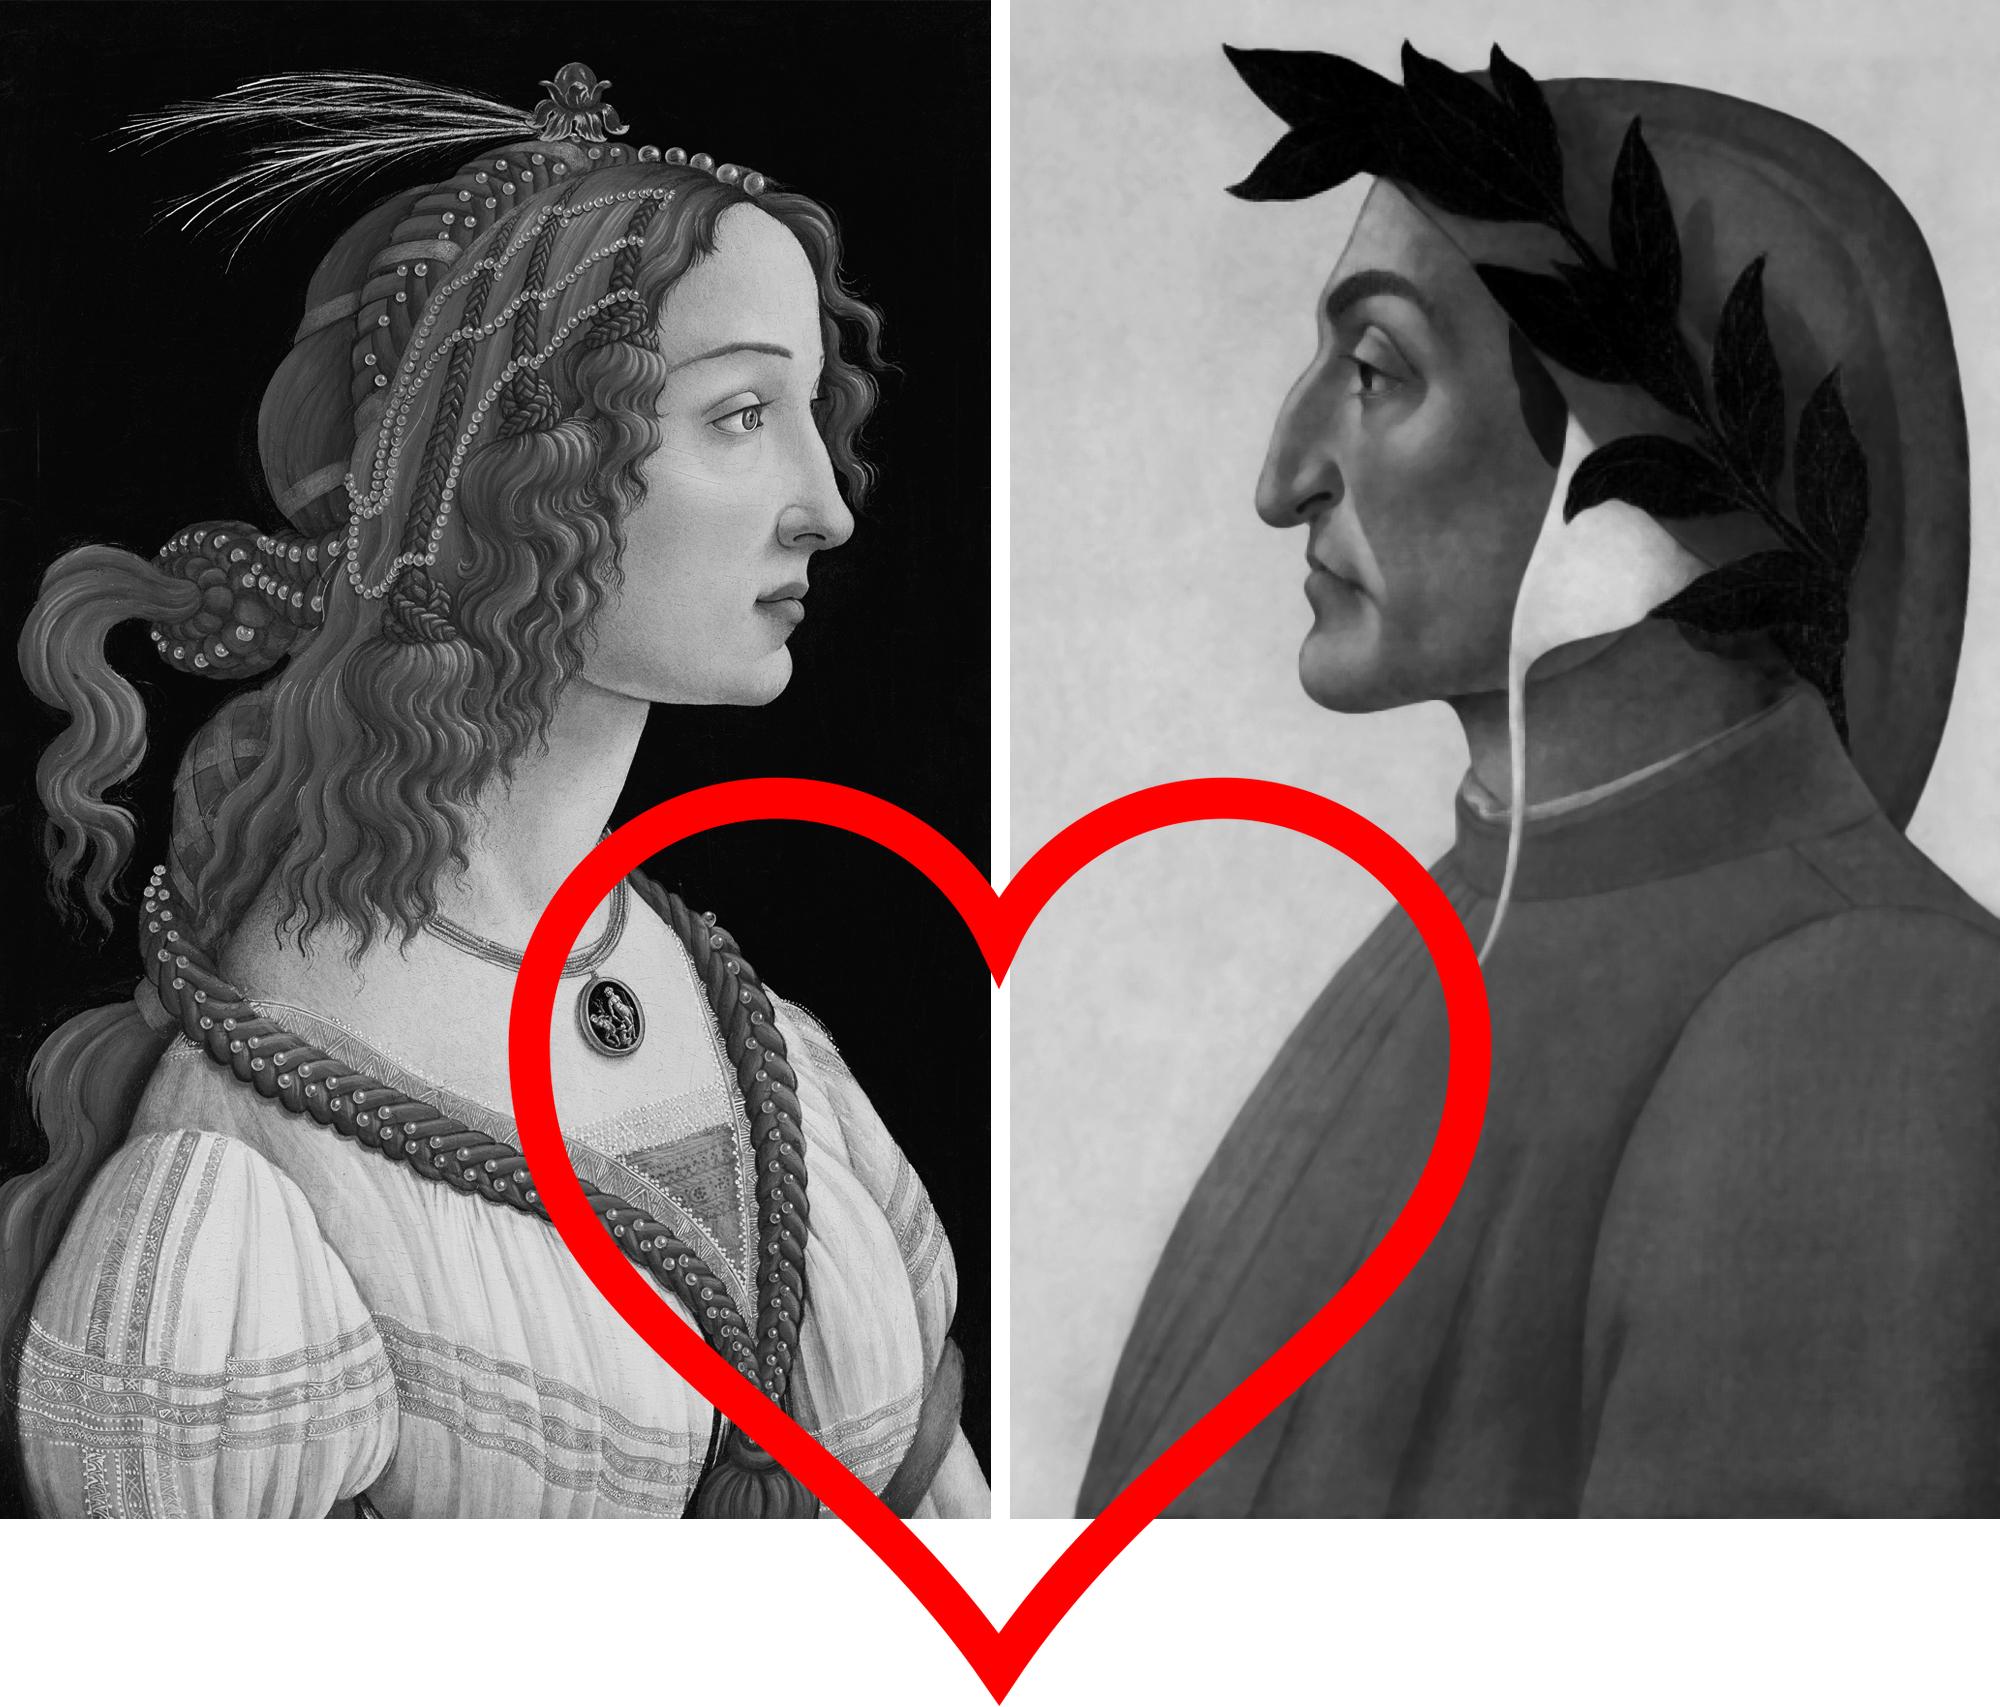 Simonetta and Dante